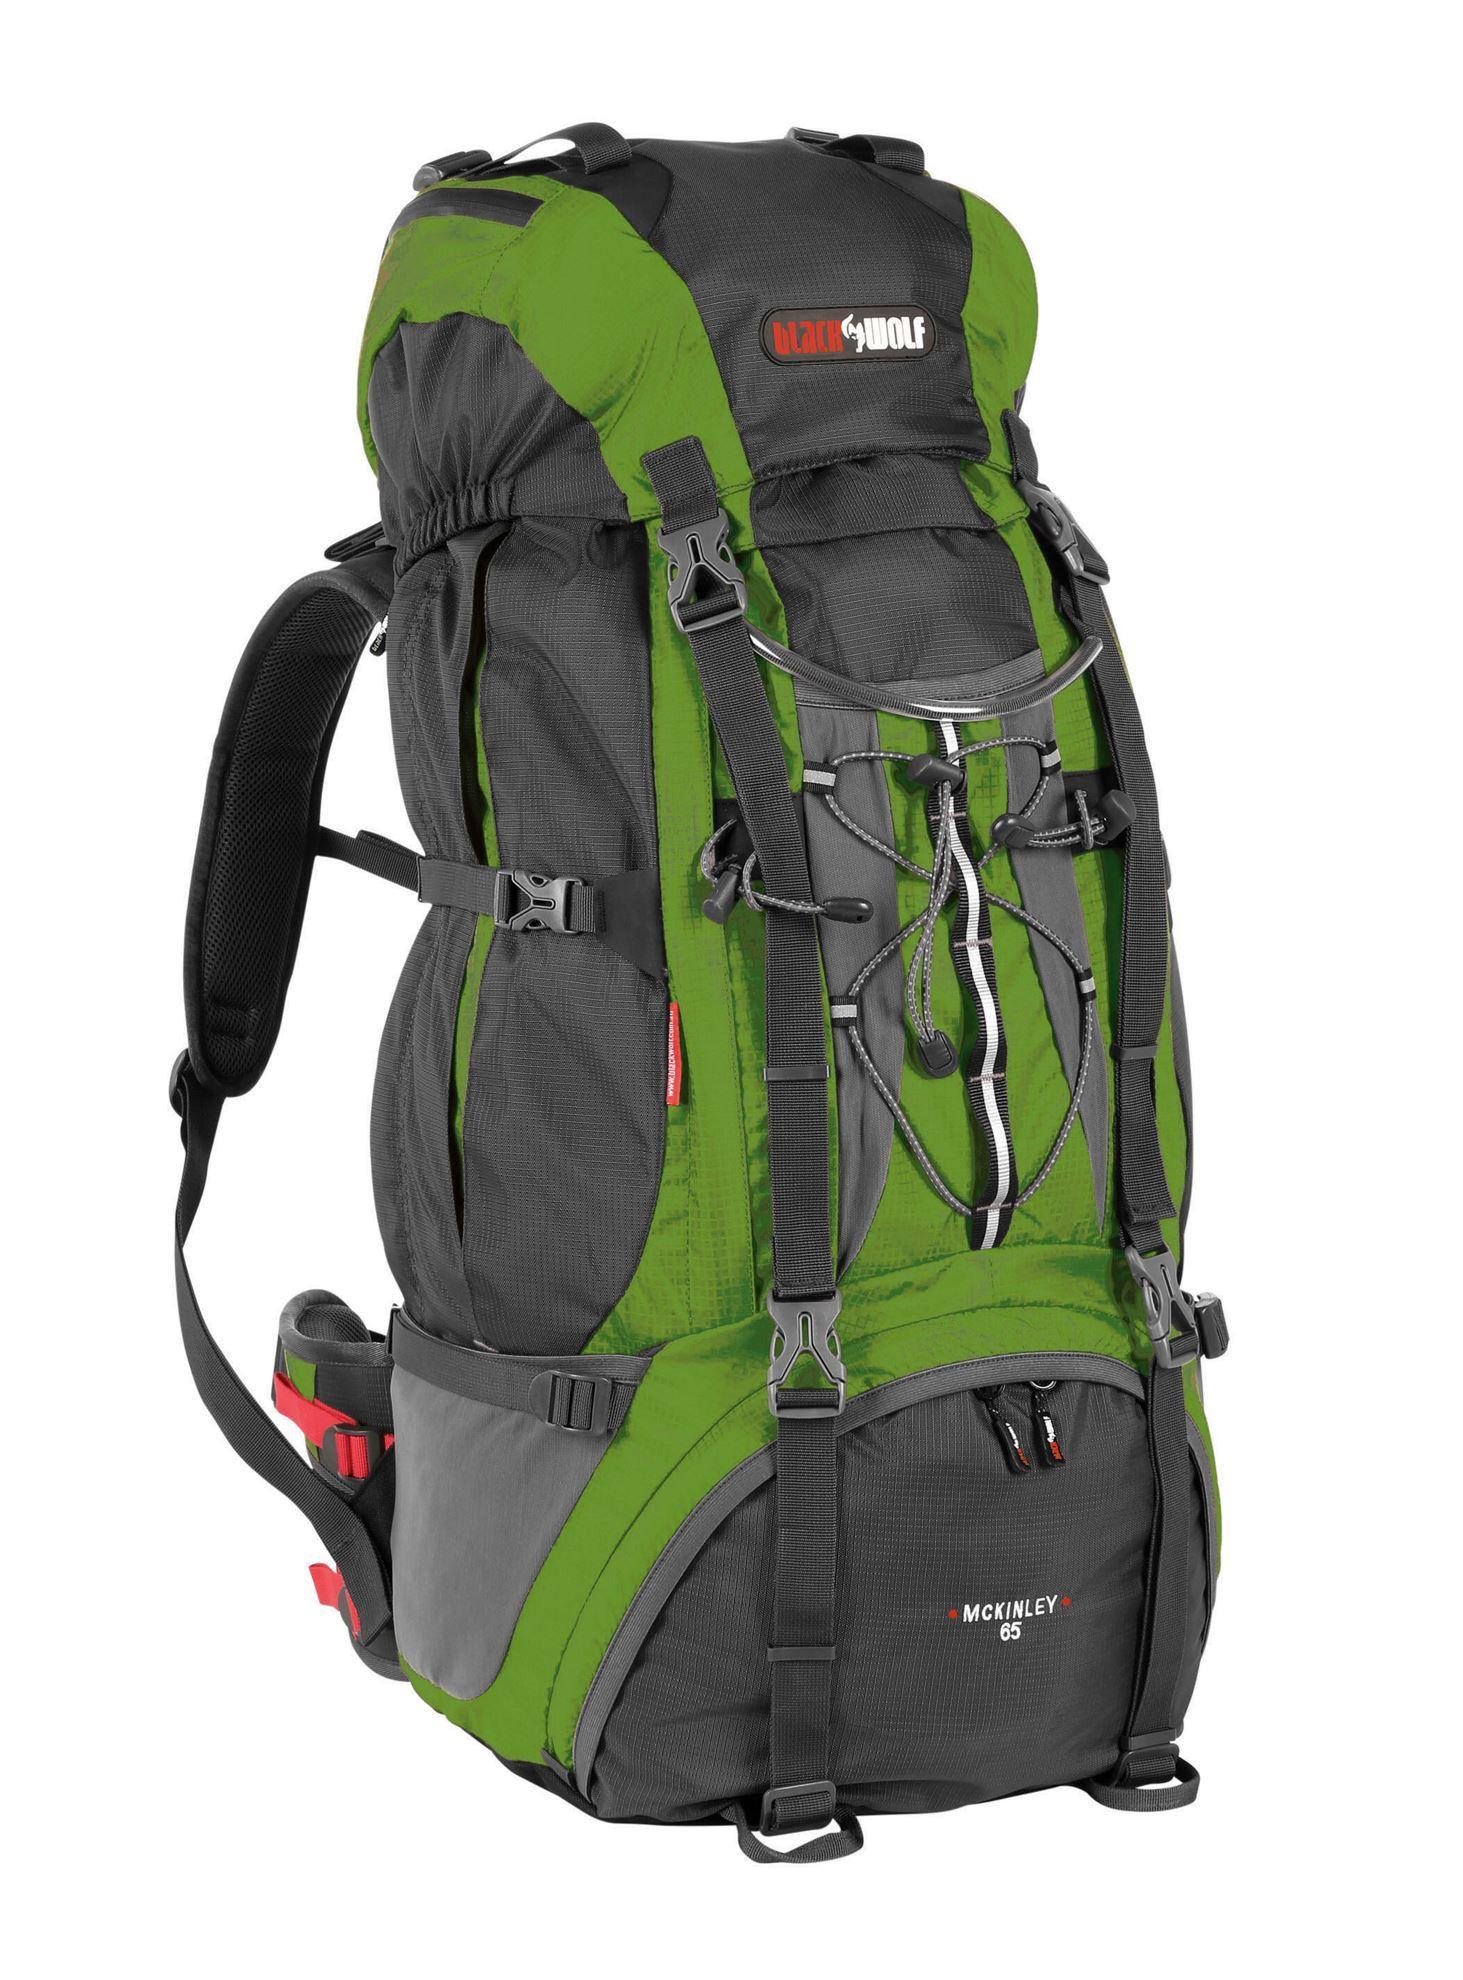 Black Wolf Mckinley Hiking Pack